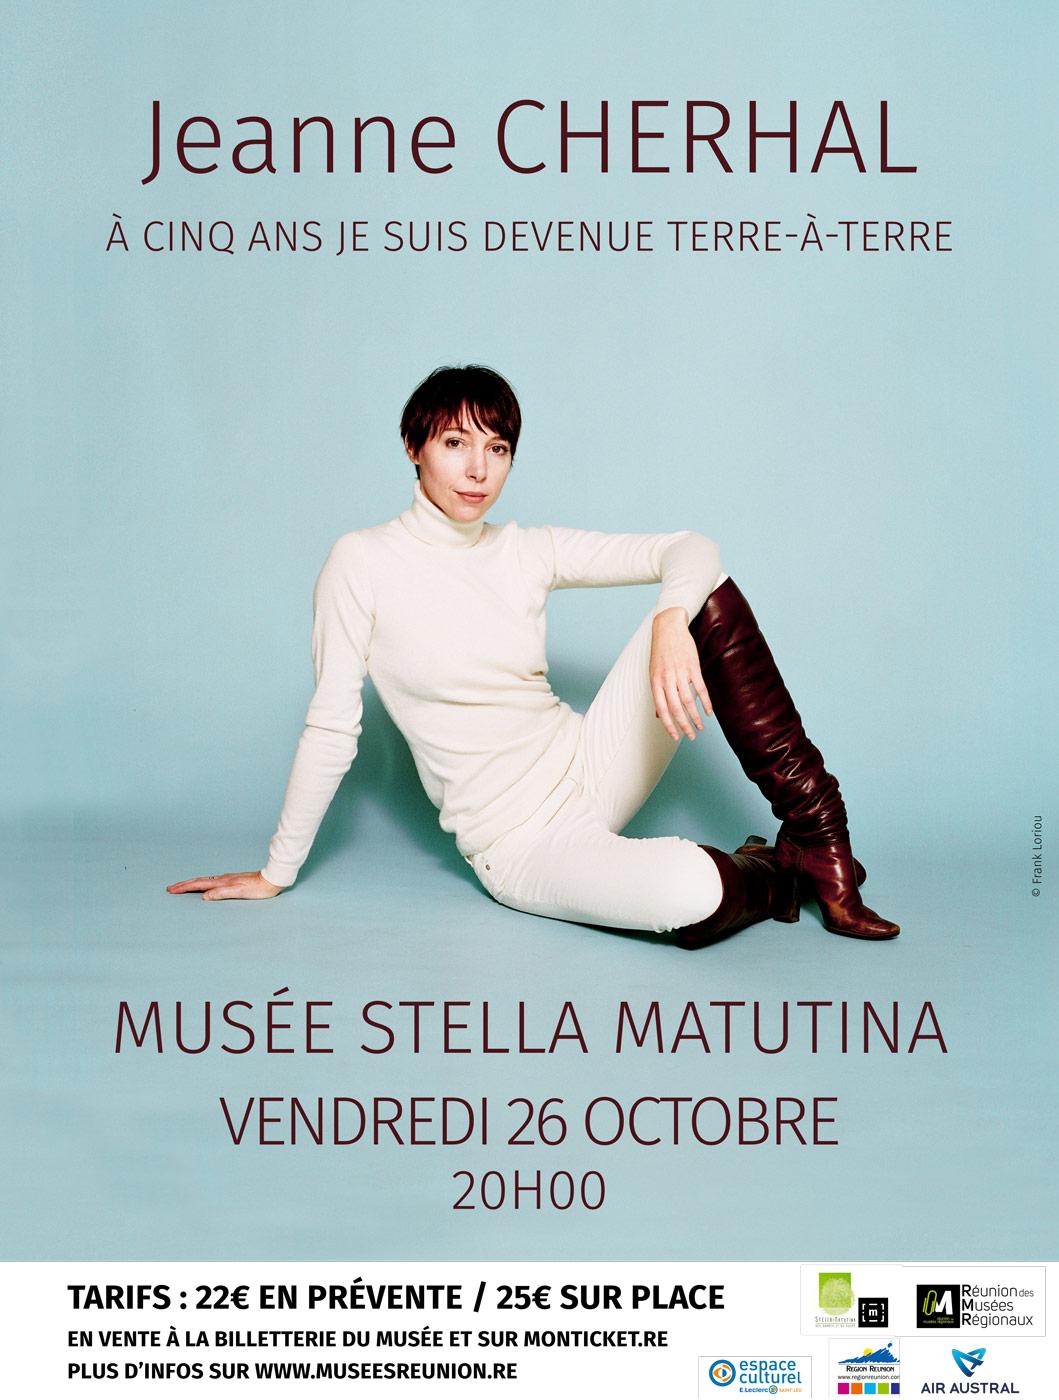 Concerts de Jeanne Cherhal au Musée Stella Matutina